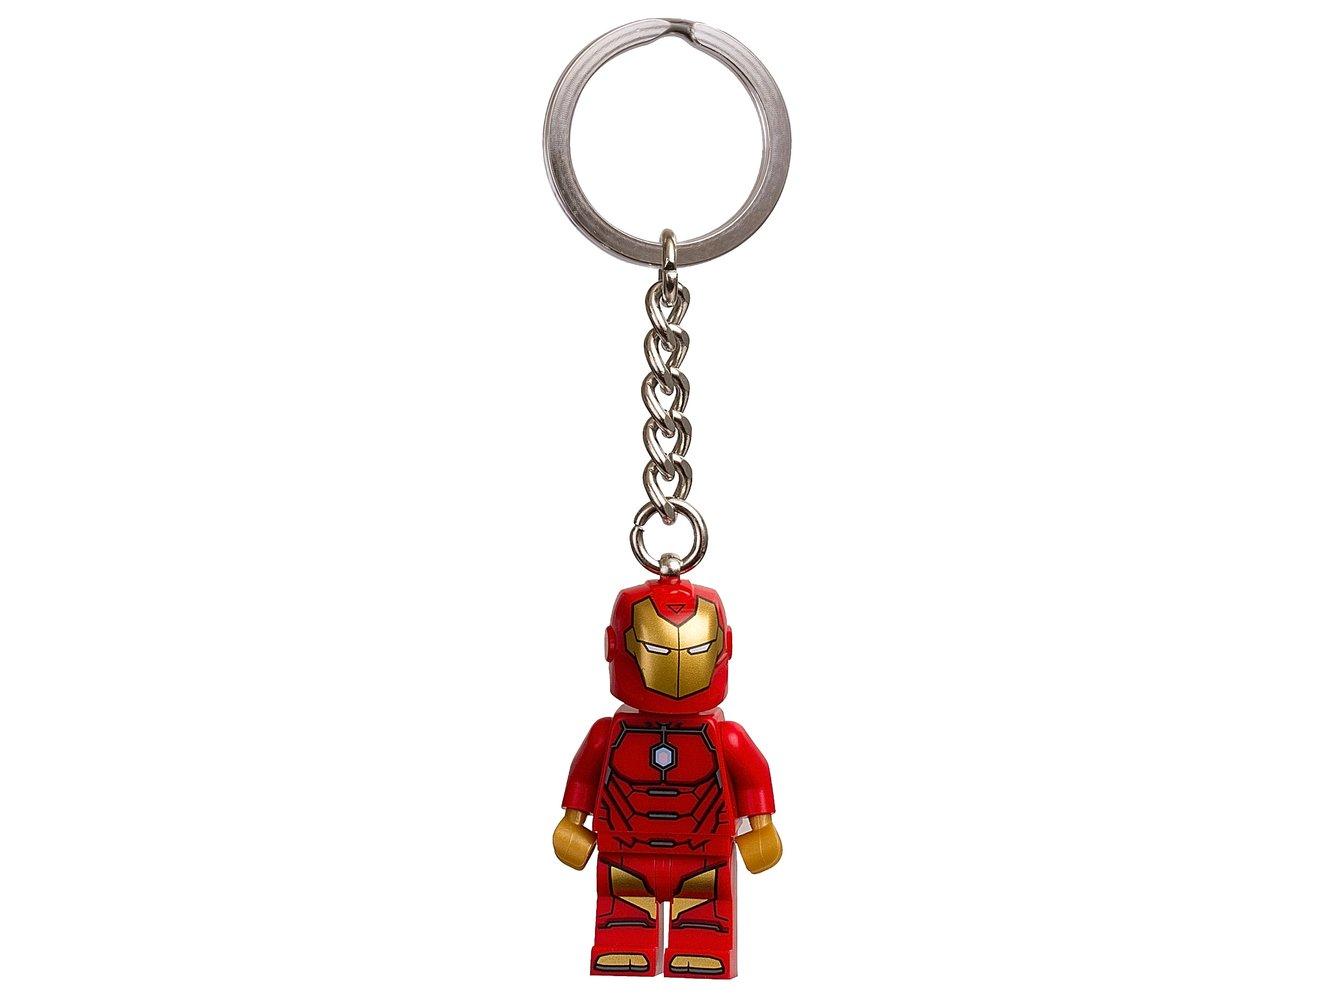 Invincible Iron Man Key Chain